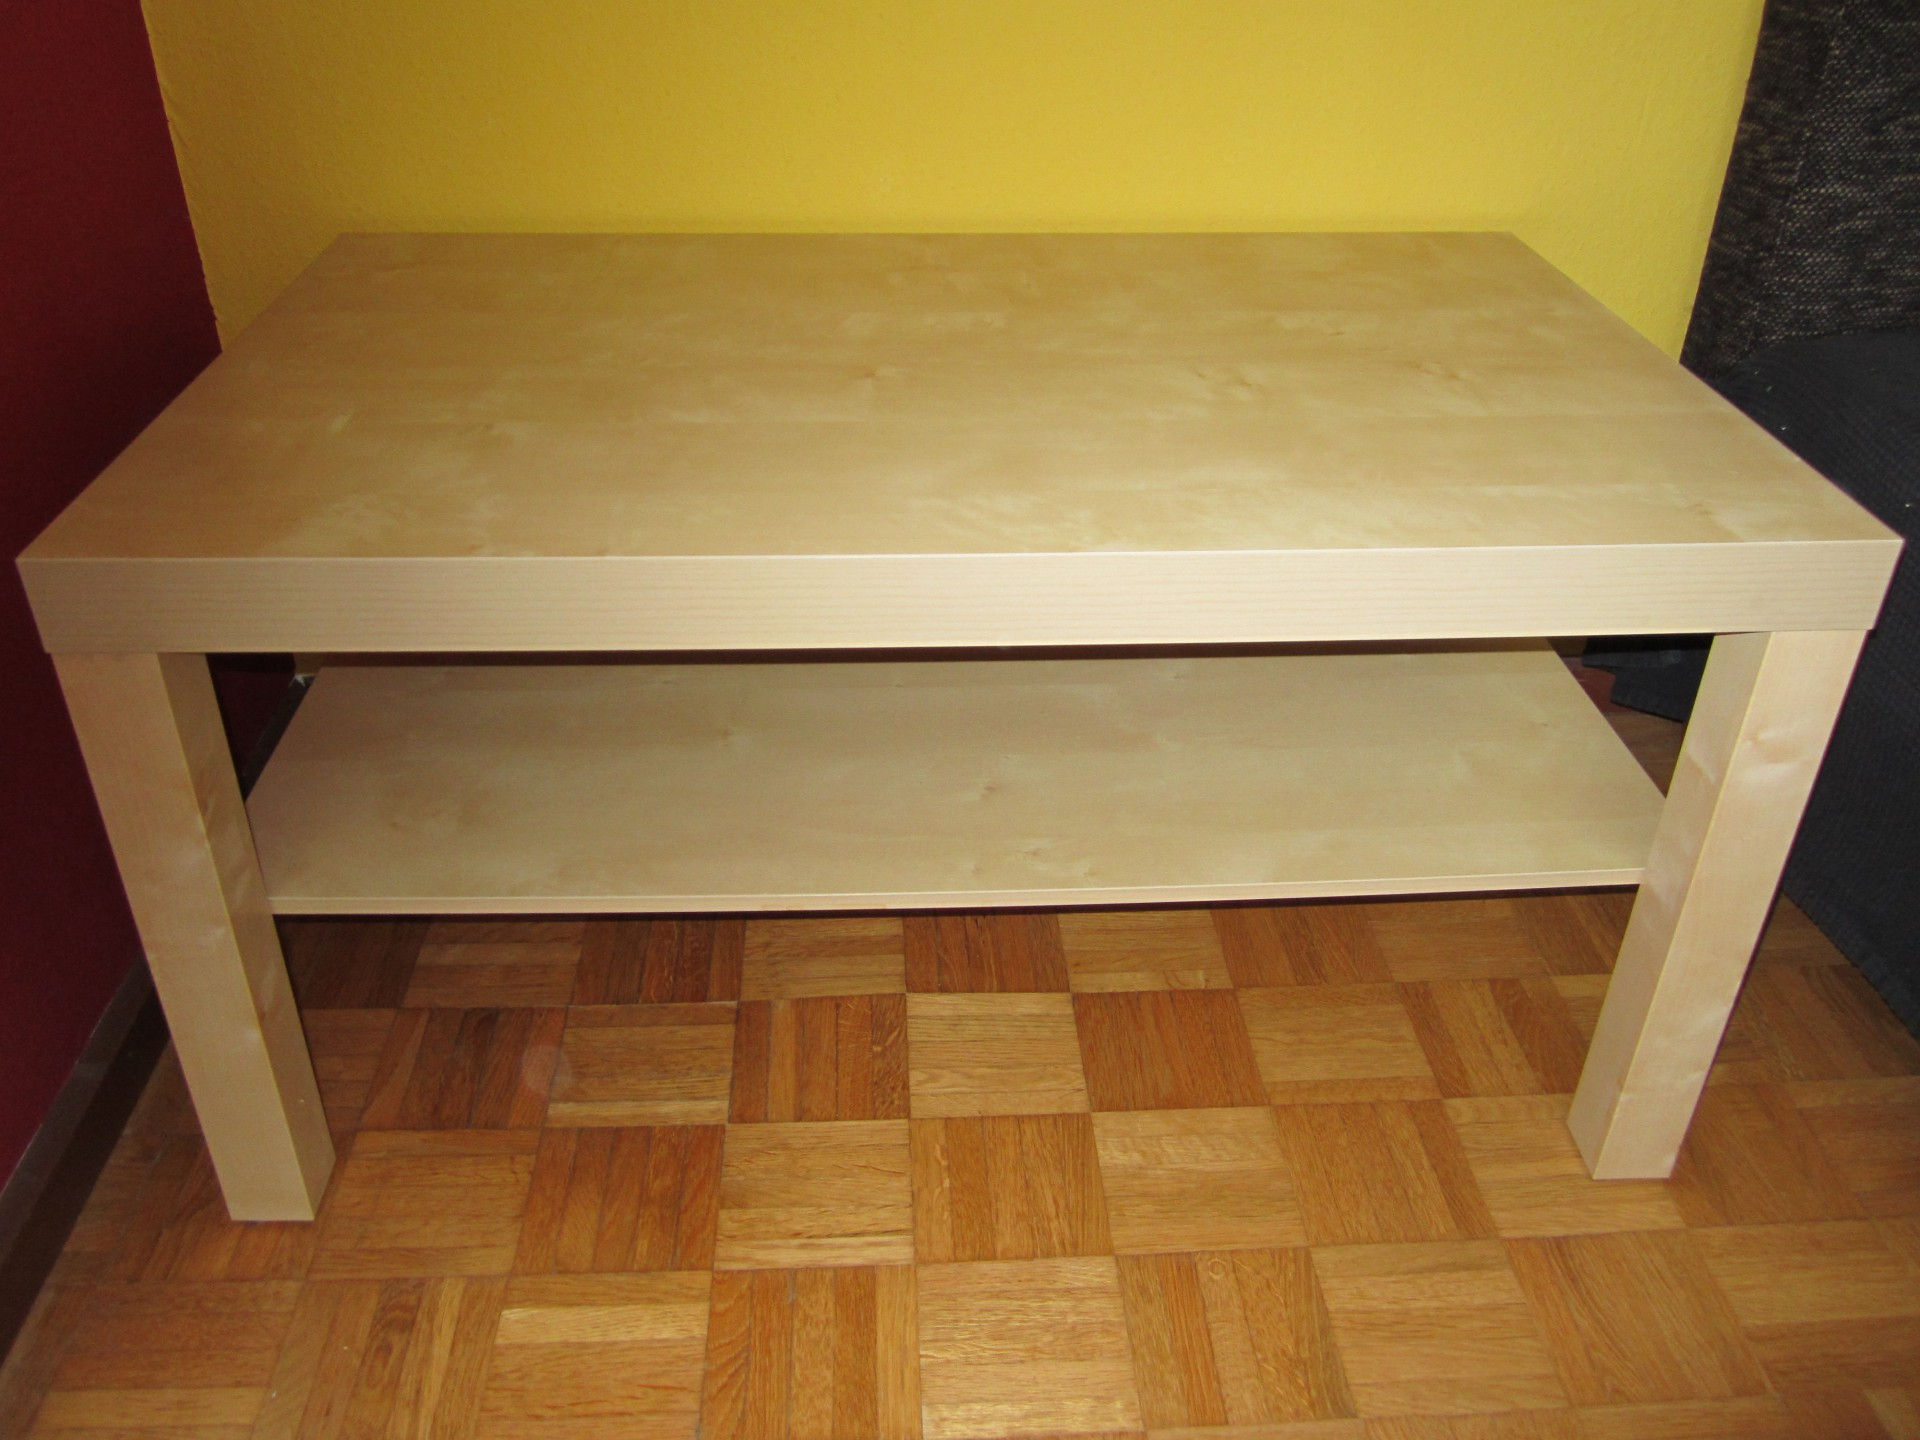 couchtisch 55 cm hoch haushaltsger te. Black Bedroom Furniture Sets. Home Design Ideas